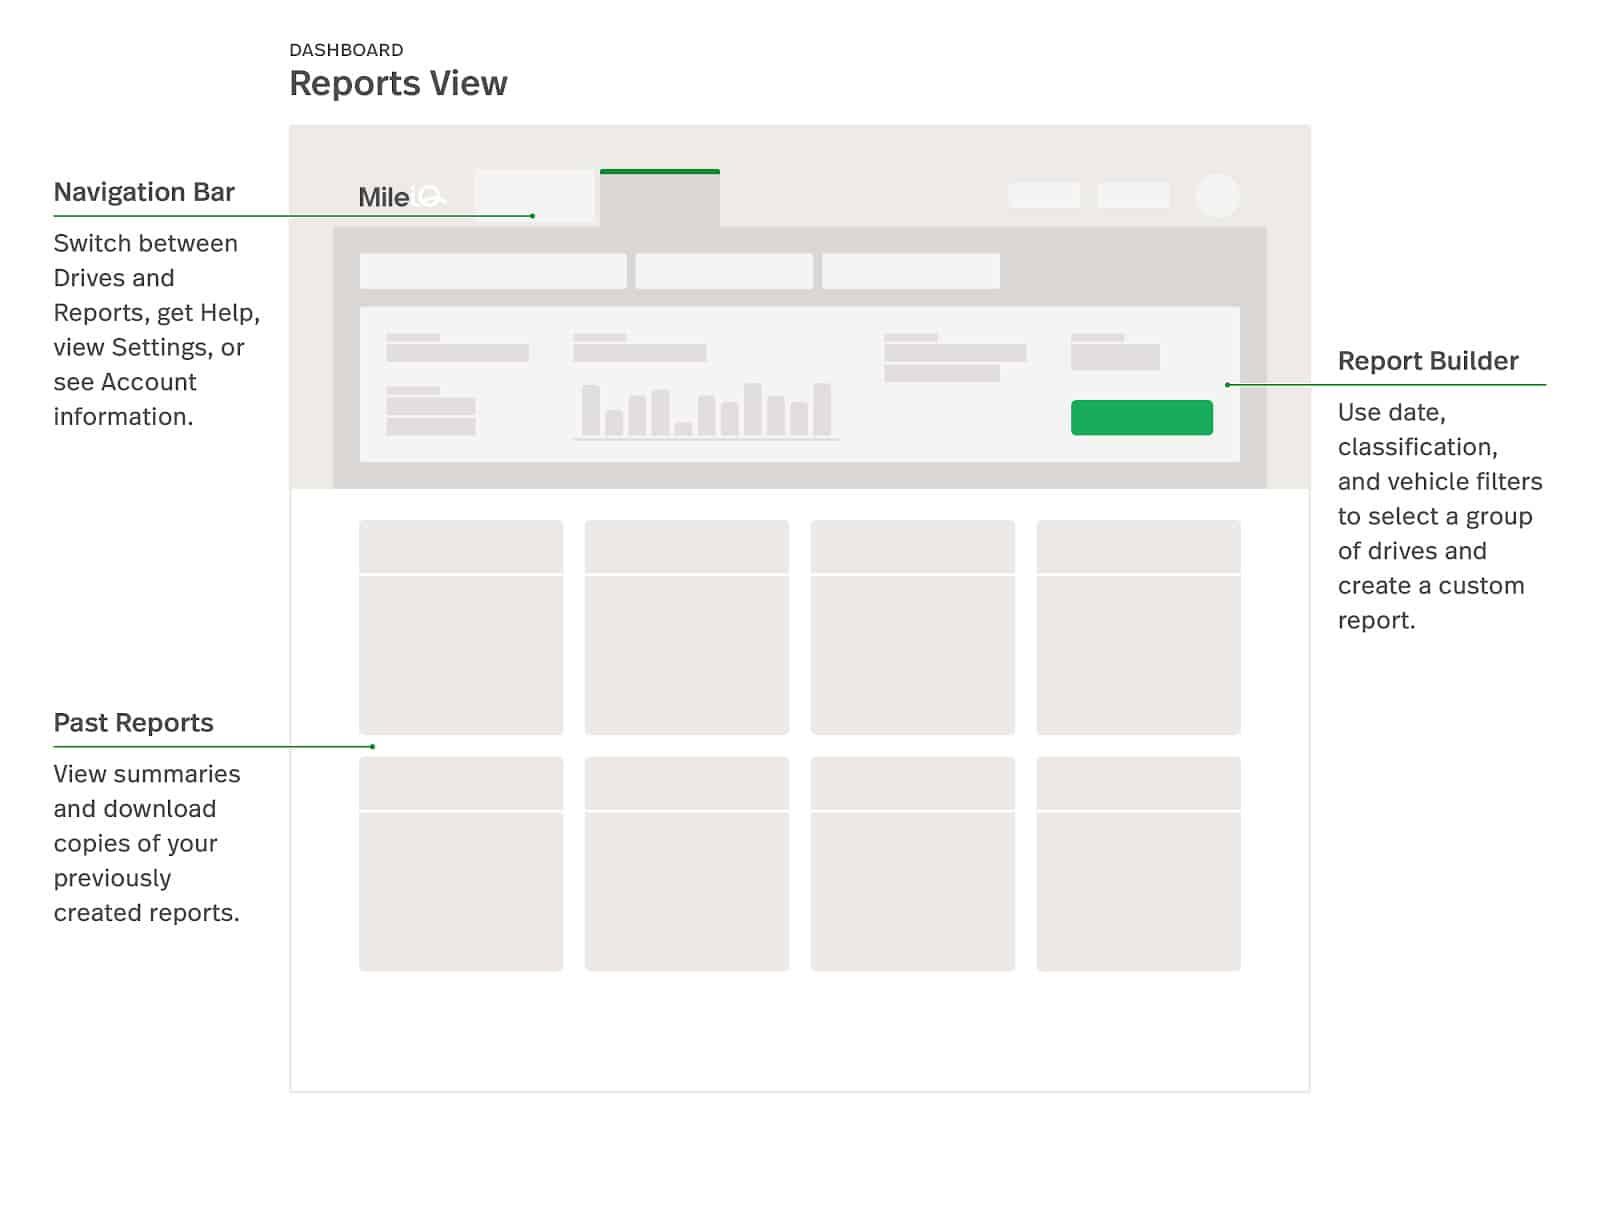 Screenshot of MileIQ The Reports View